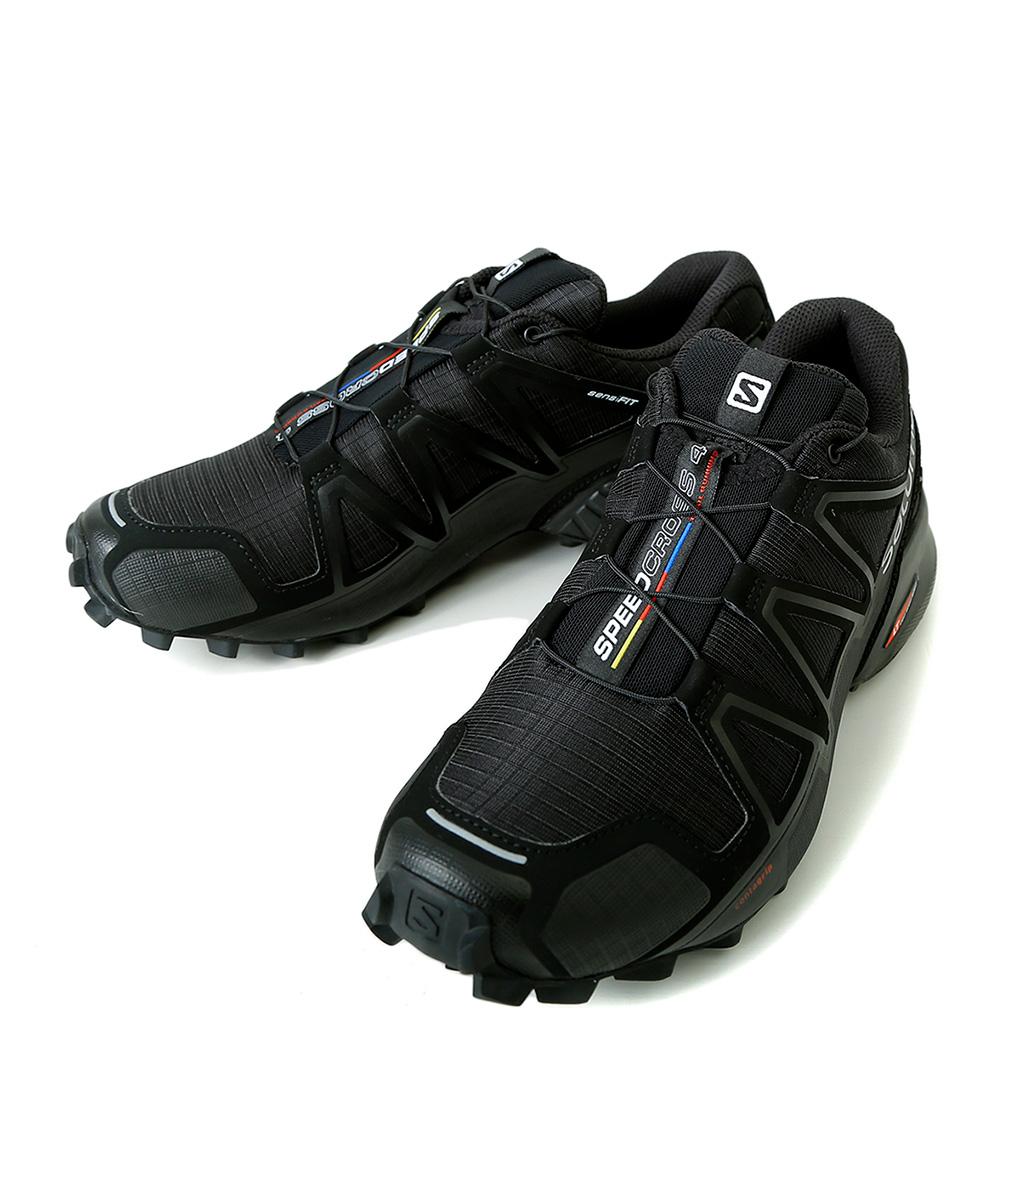 SALOMON / サロモン : SPEEDCROSS 4 BLACK/BLACK/BLACK METALLIC : スピードクロス スニーカー アウトドア シューズ メンズ : L38313000【REA】